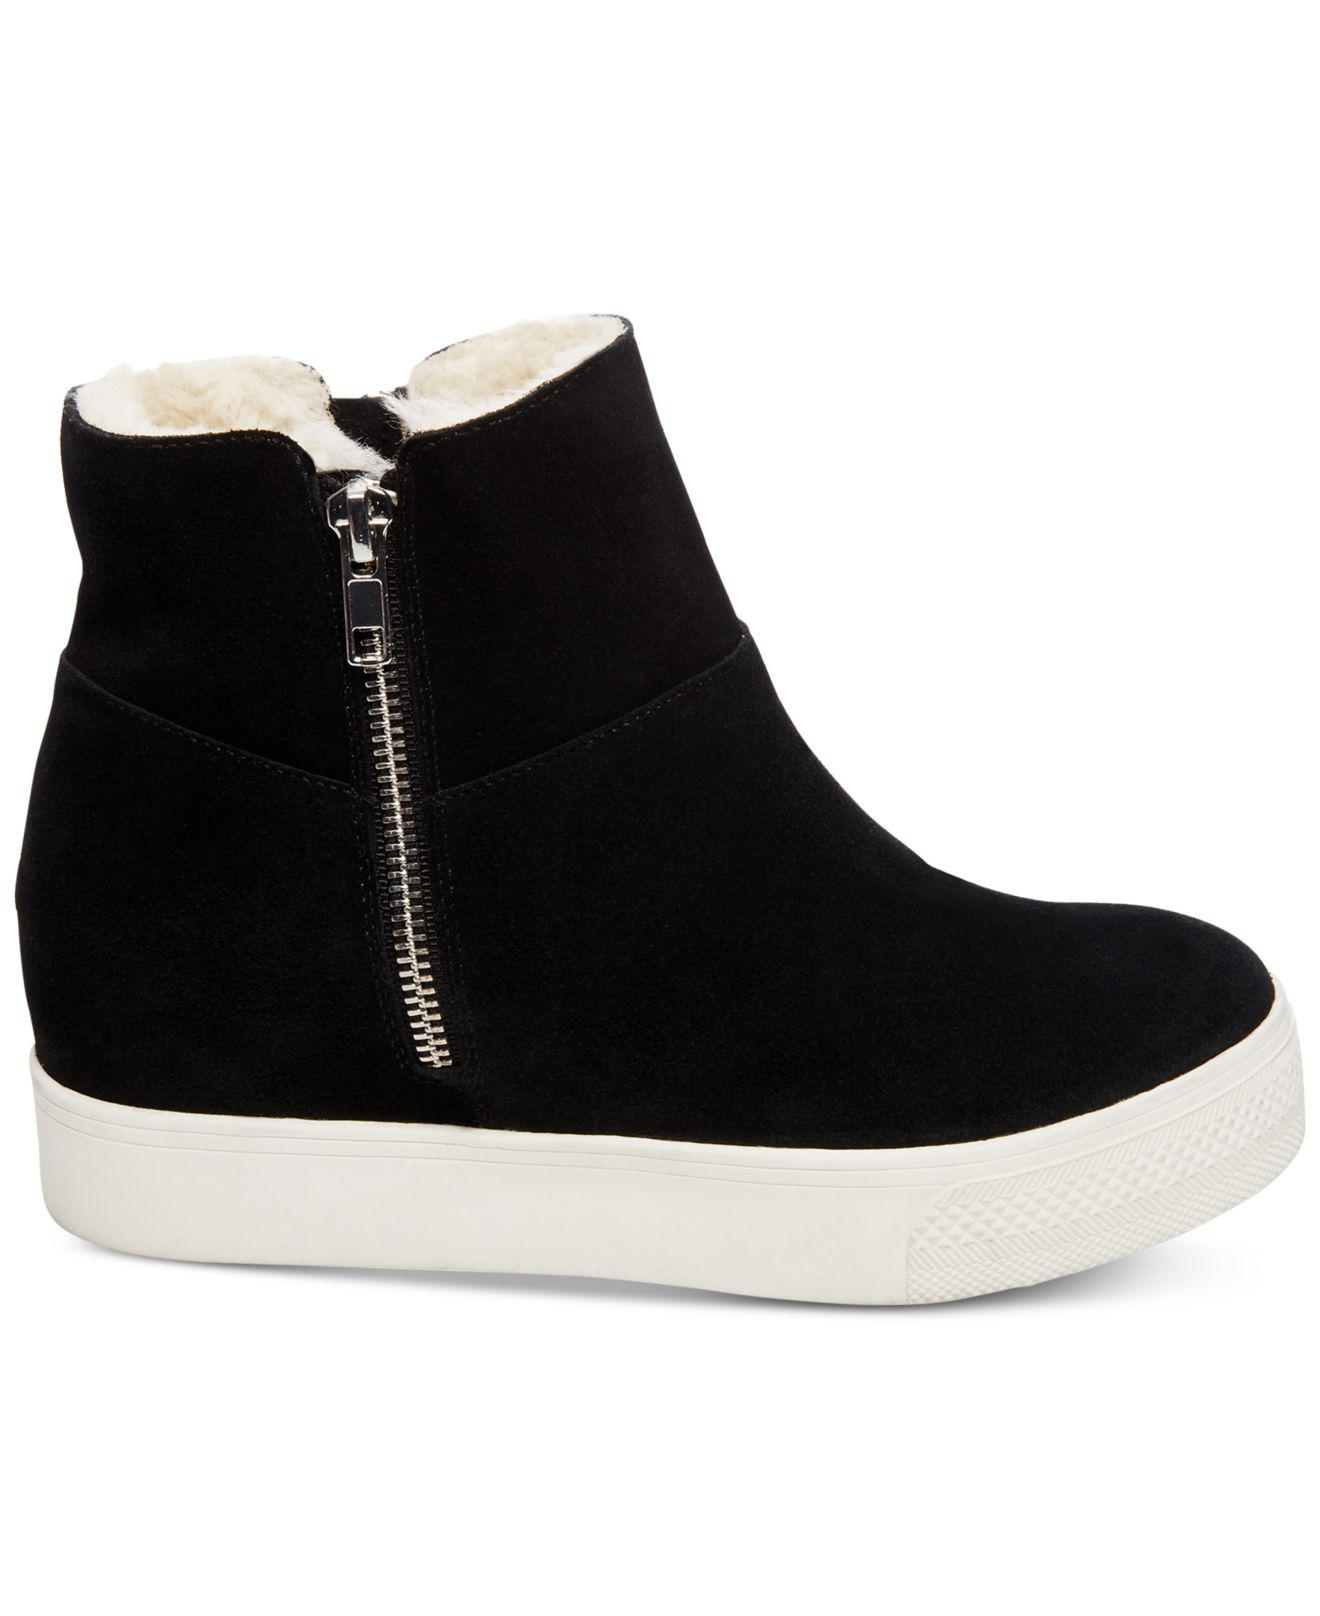 b7661581b1b Lyst - Steve Madden Wanda Faux-fur Wedge Sneakers in Black - Save 54%